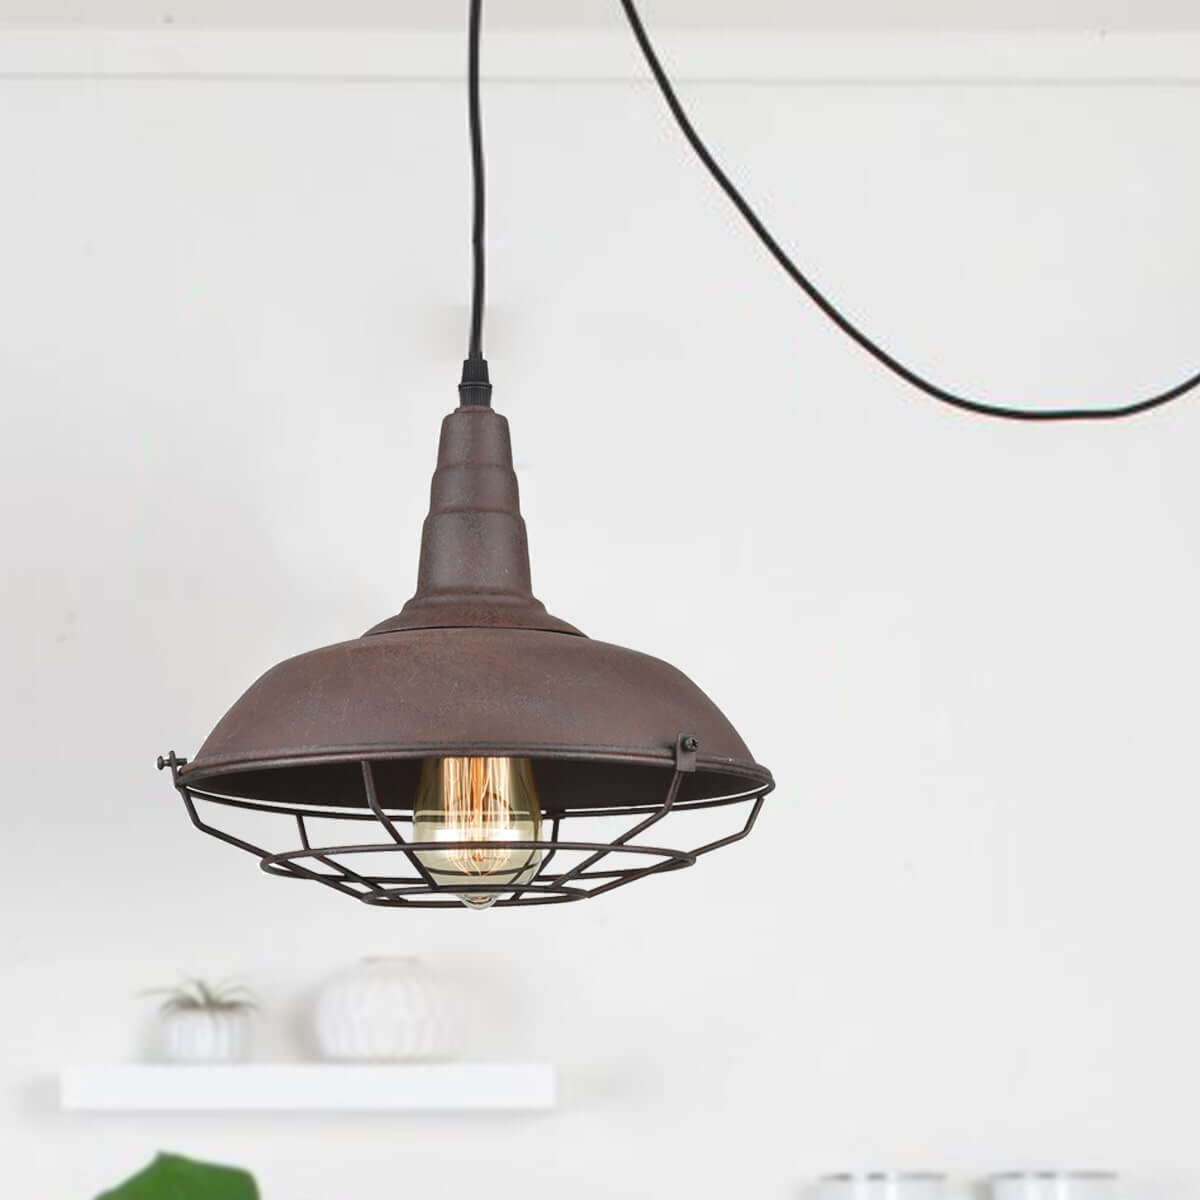 Modern-Farmhouse-Plug-In-Pendant-Light-Rust-Finish